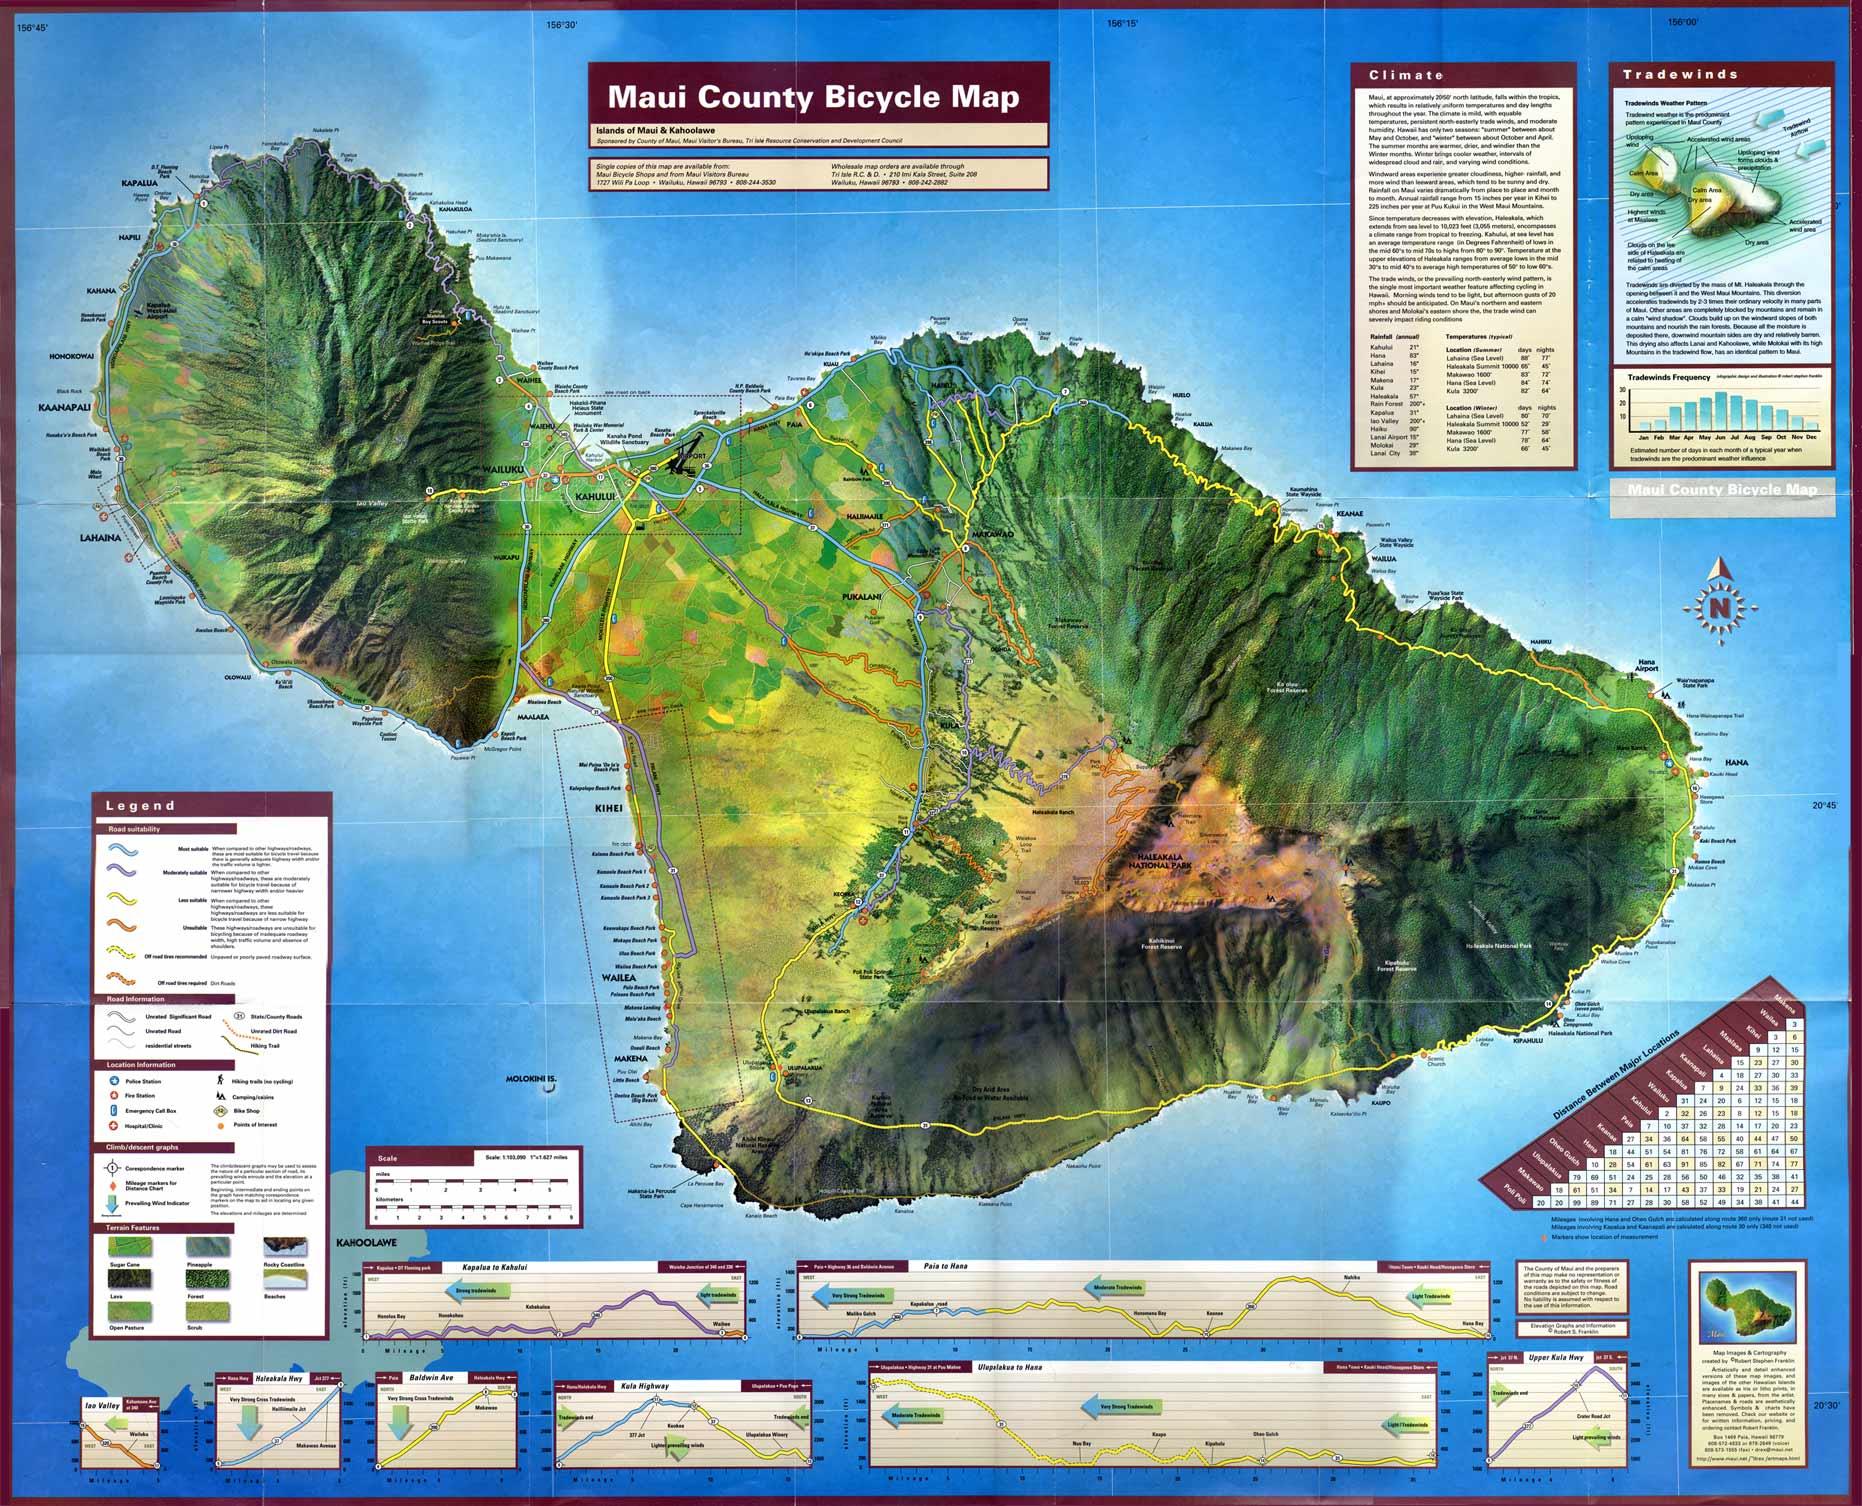 photo regarding Printable Maps of Maui named Maui Motorcycle Map - Maui Bicycling League